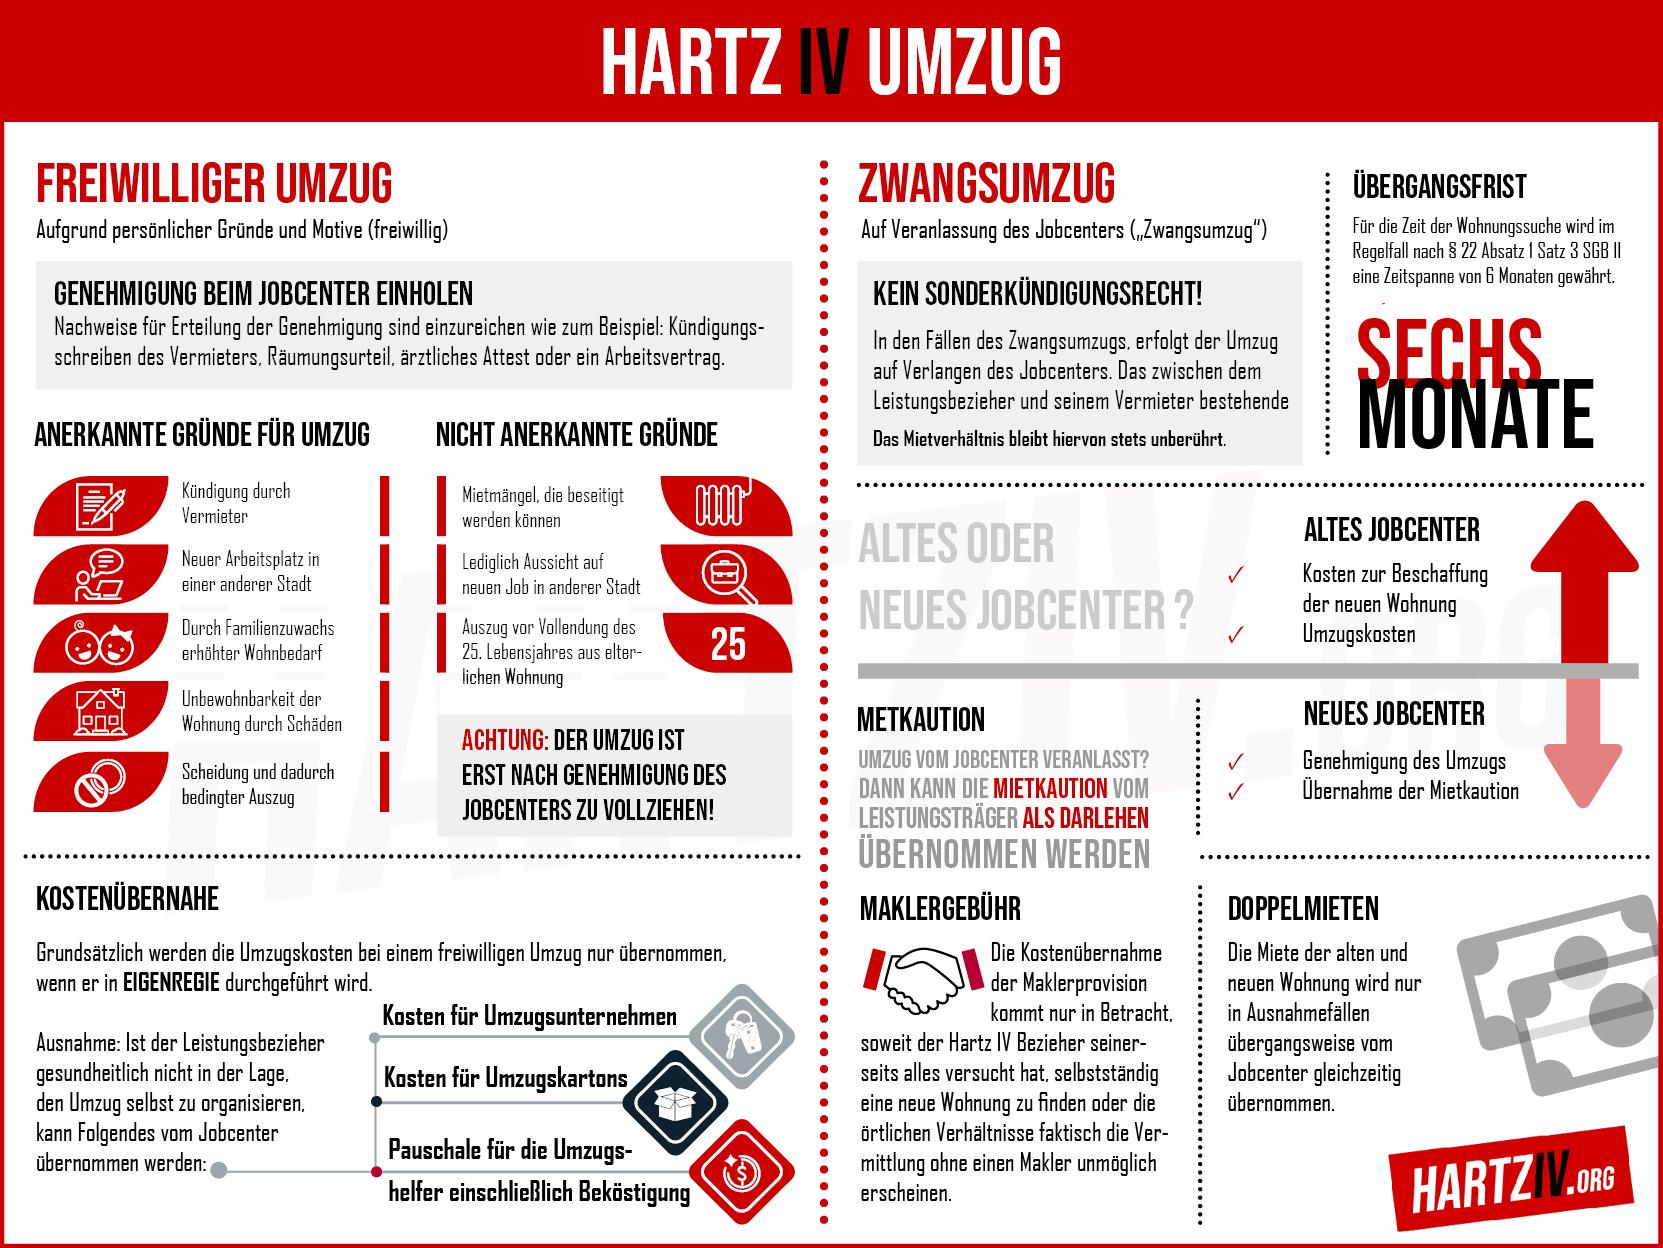 Umzug Bei Hartz Iv Das Steht Dir Zu Hartziv Org